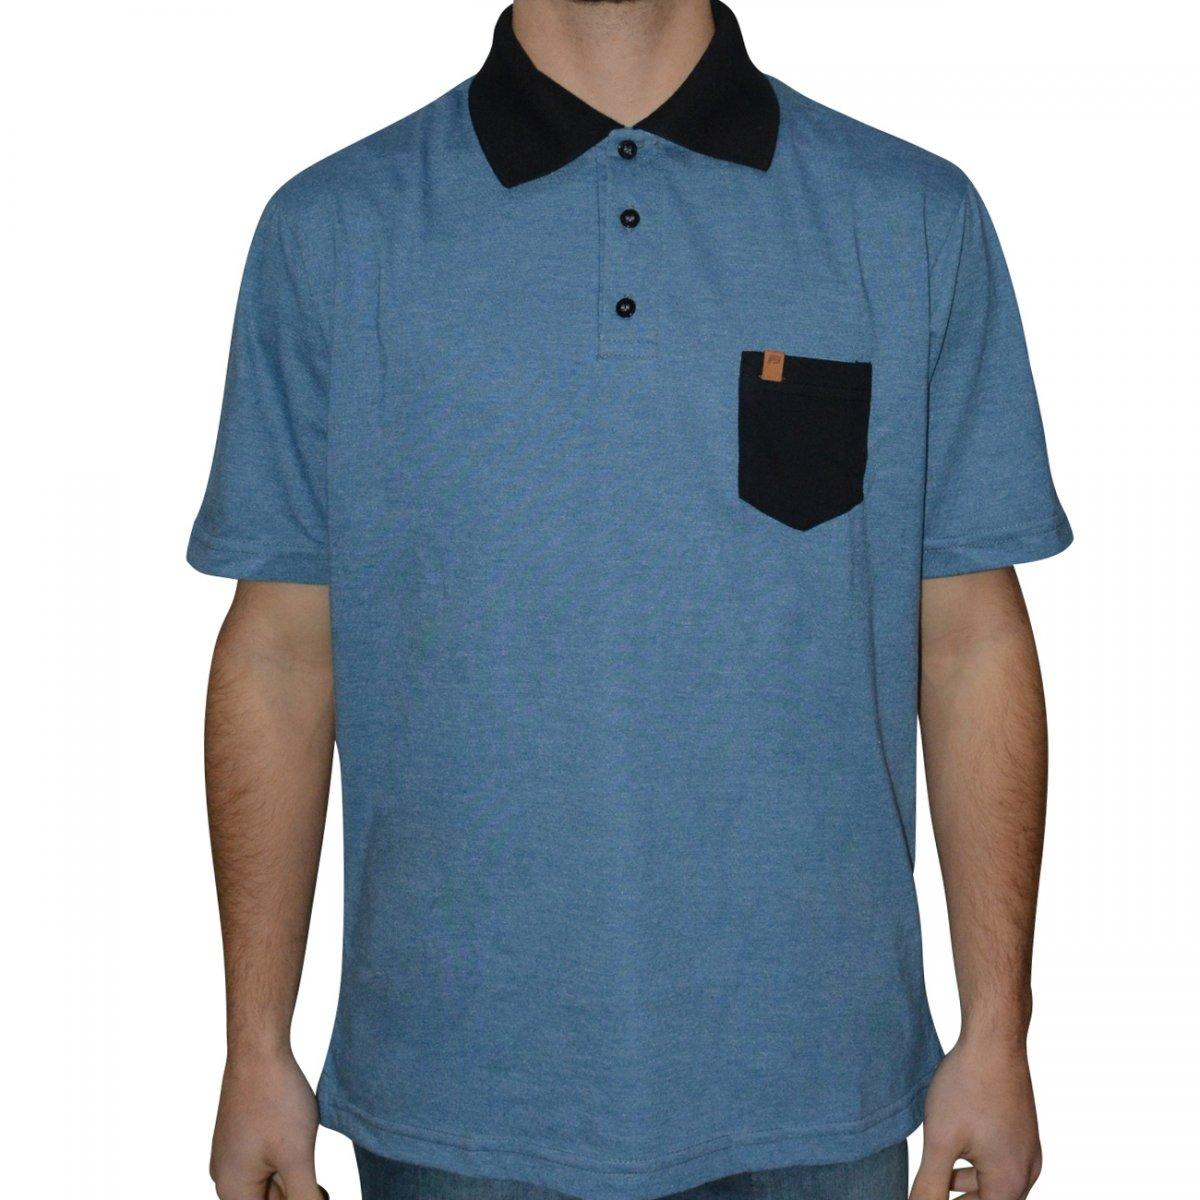 Camisa Polo Free Surf Nice 110502374 - Azul preto - Chuteira Nike ... 555080438cf71